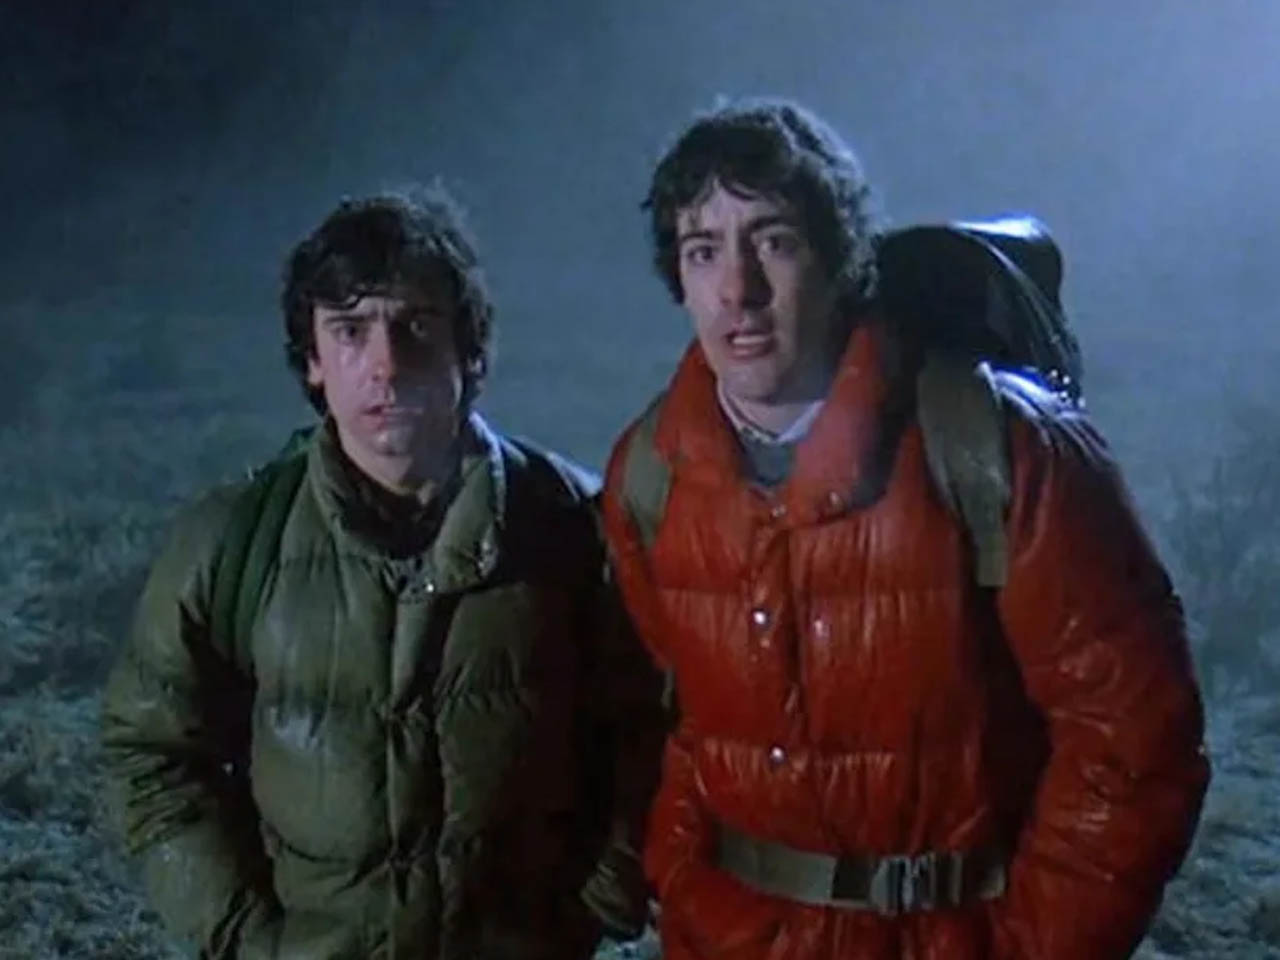 1981 Movie Project - An American Werewolf in London - 01